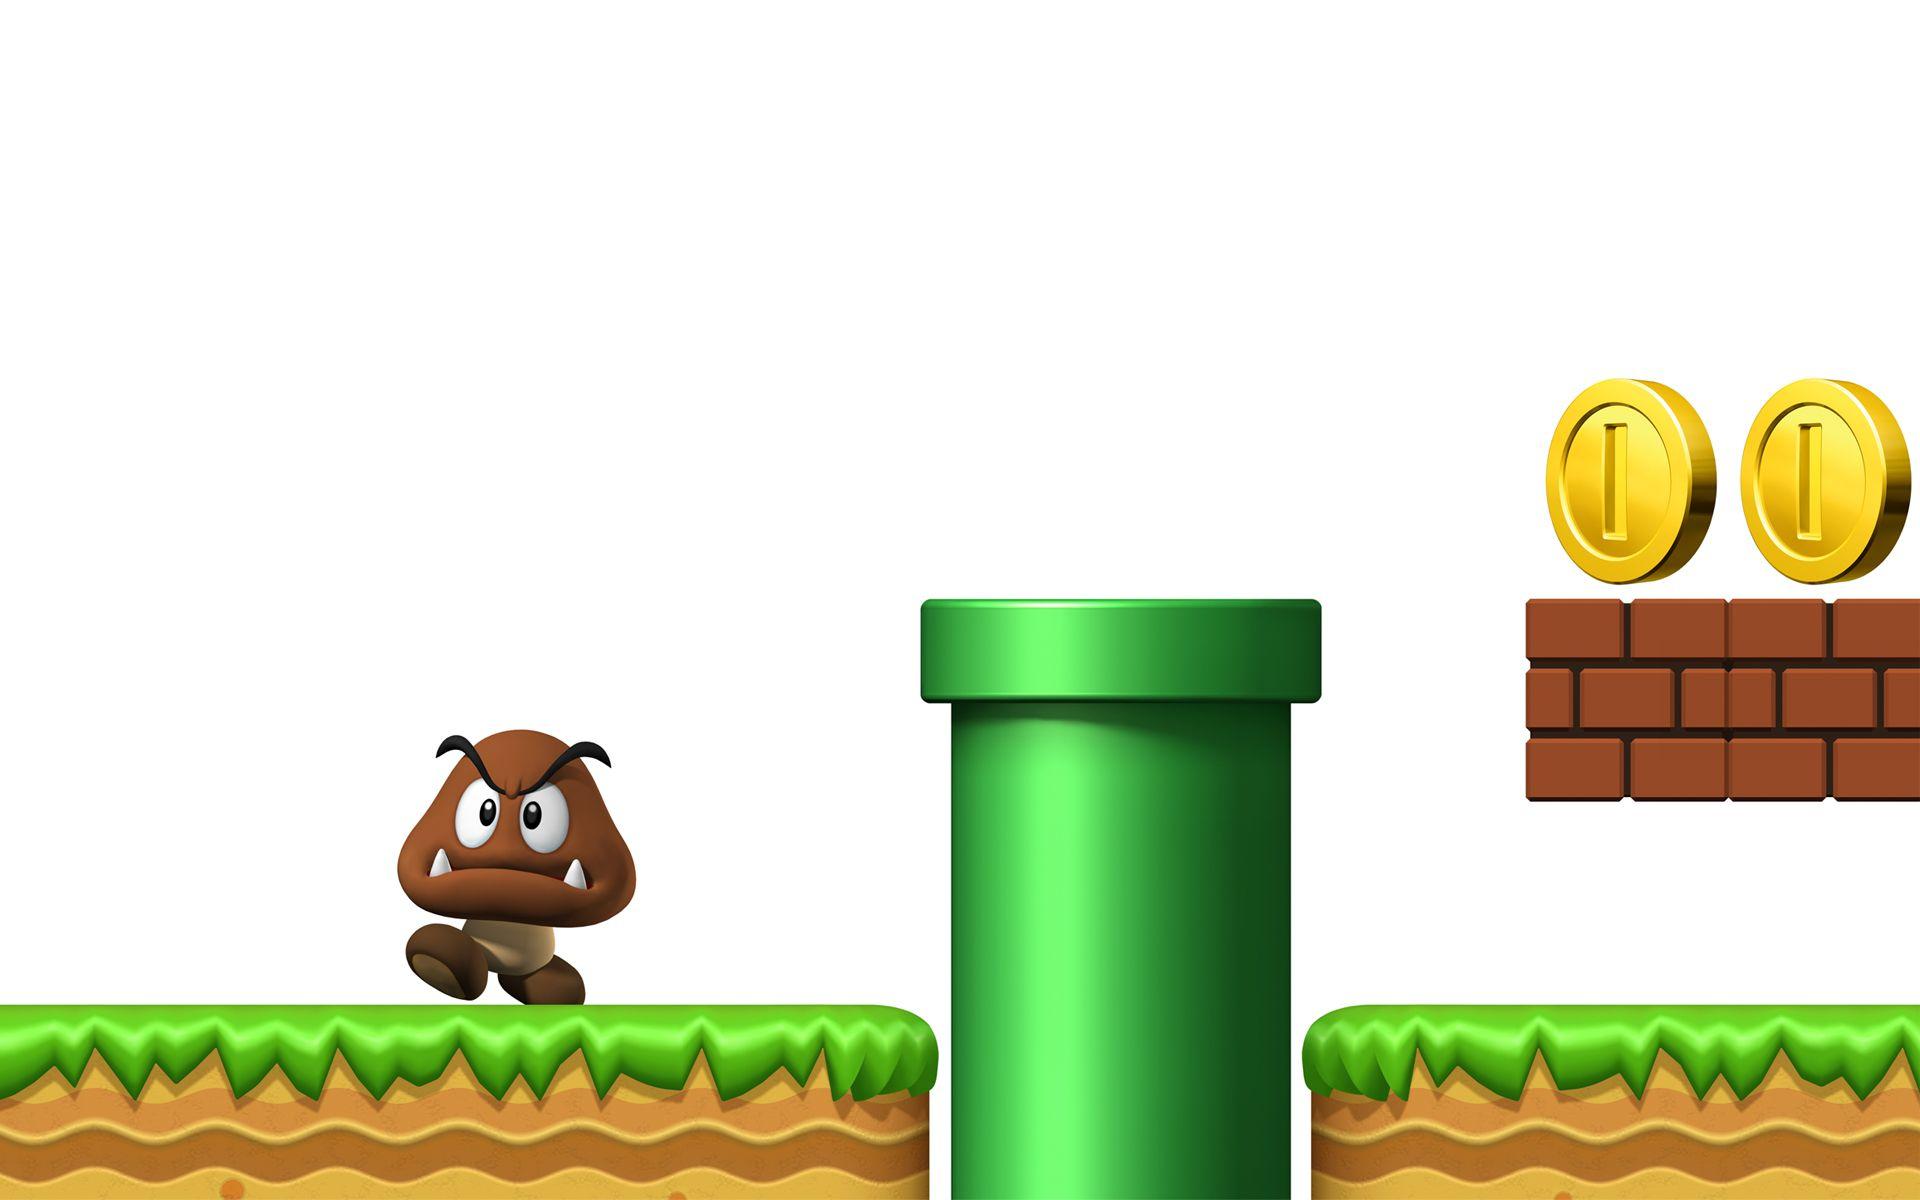 Super Mario Bros Wallpaper Hd Free Pc Wallpaper New Game Photos